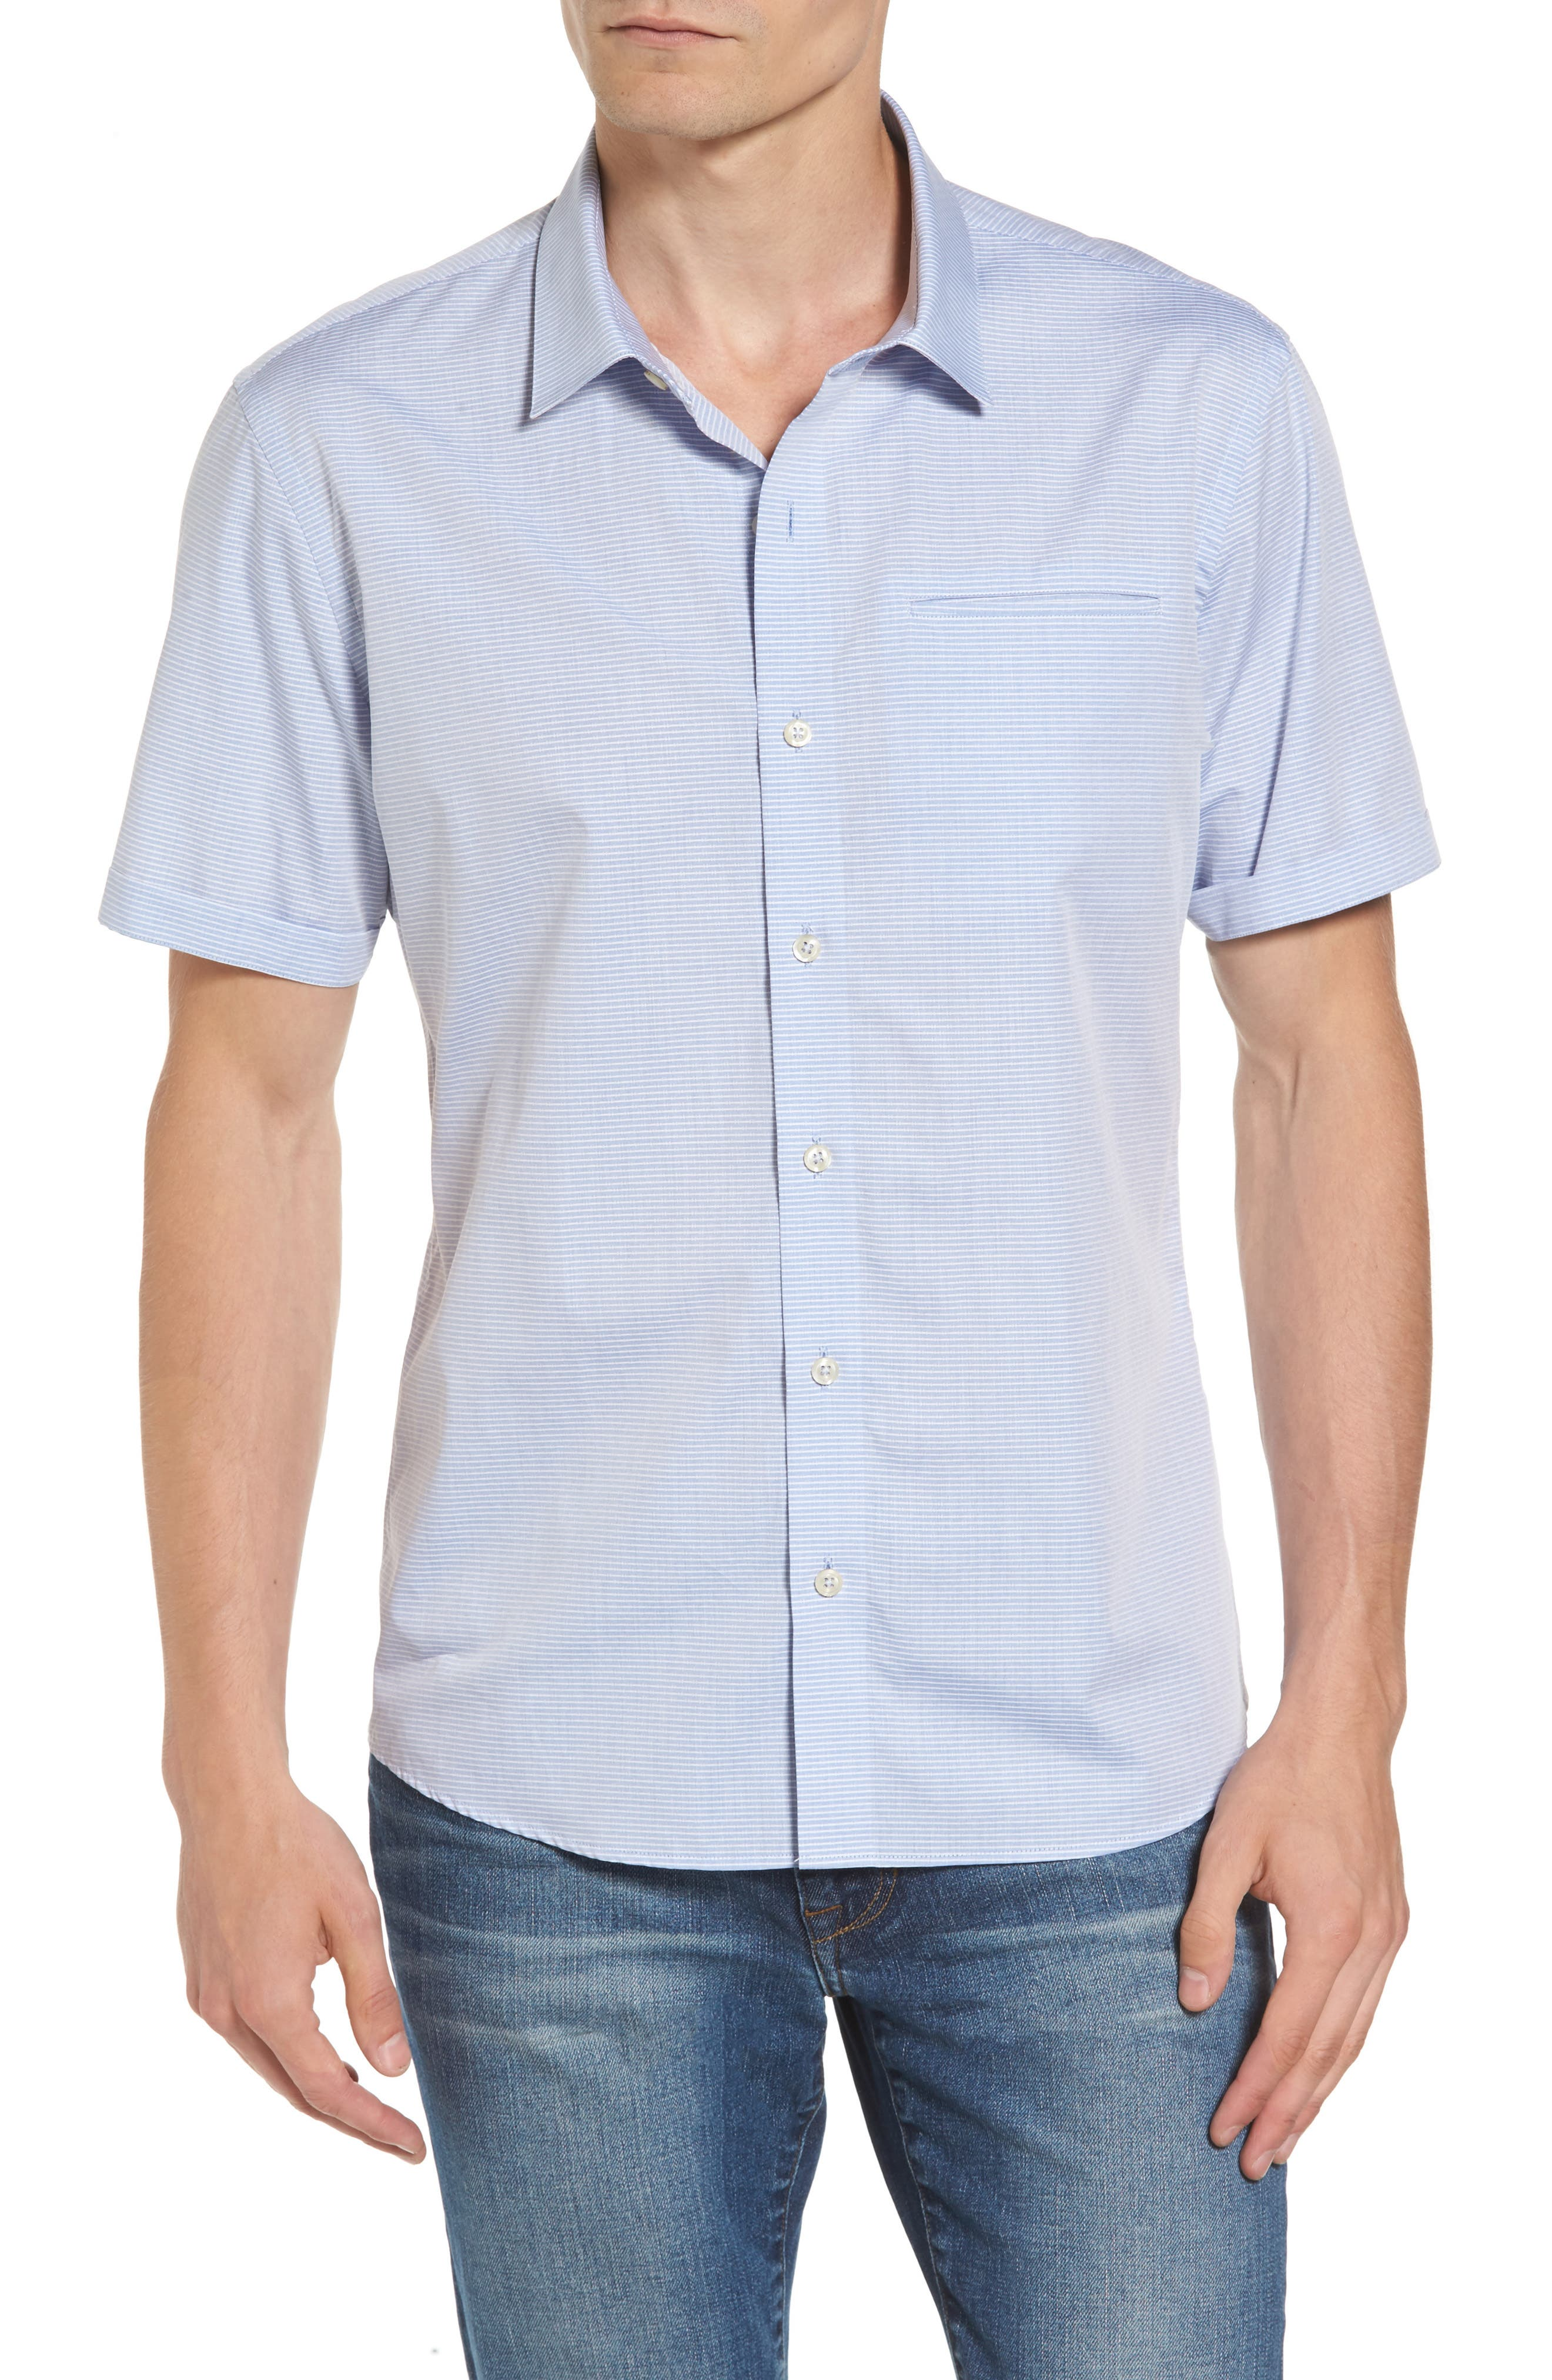 Main Image - 7 Diamonds Stripe Woven Shirt